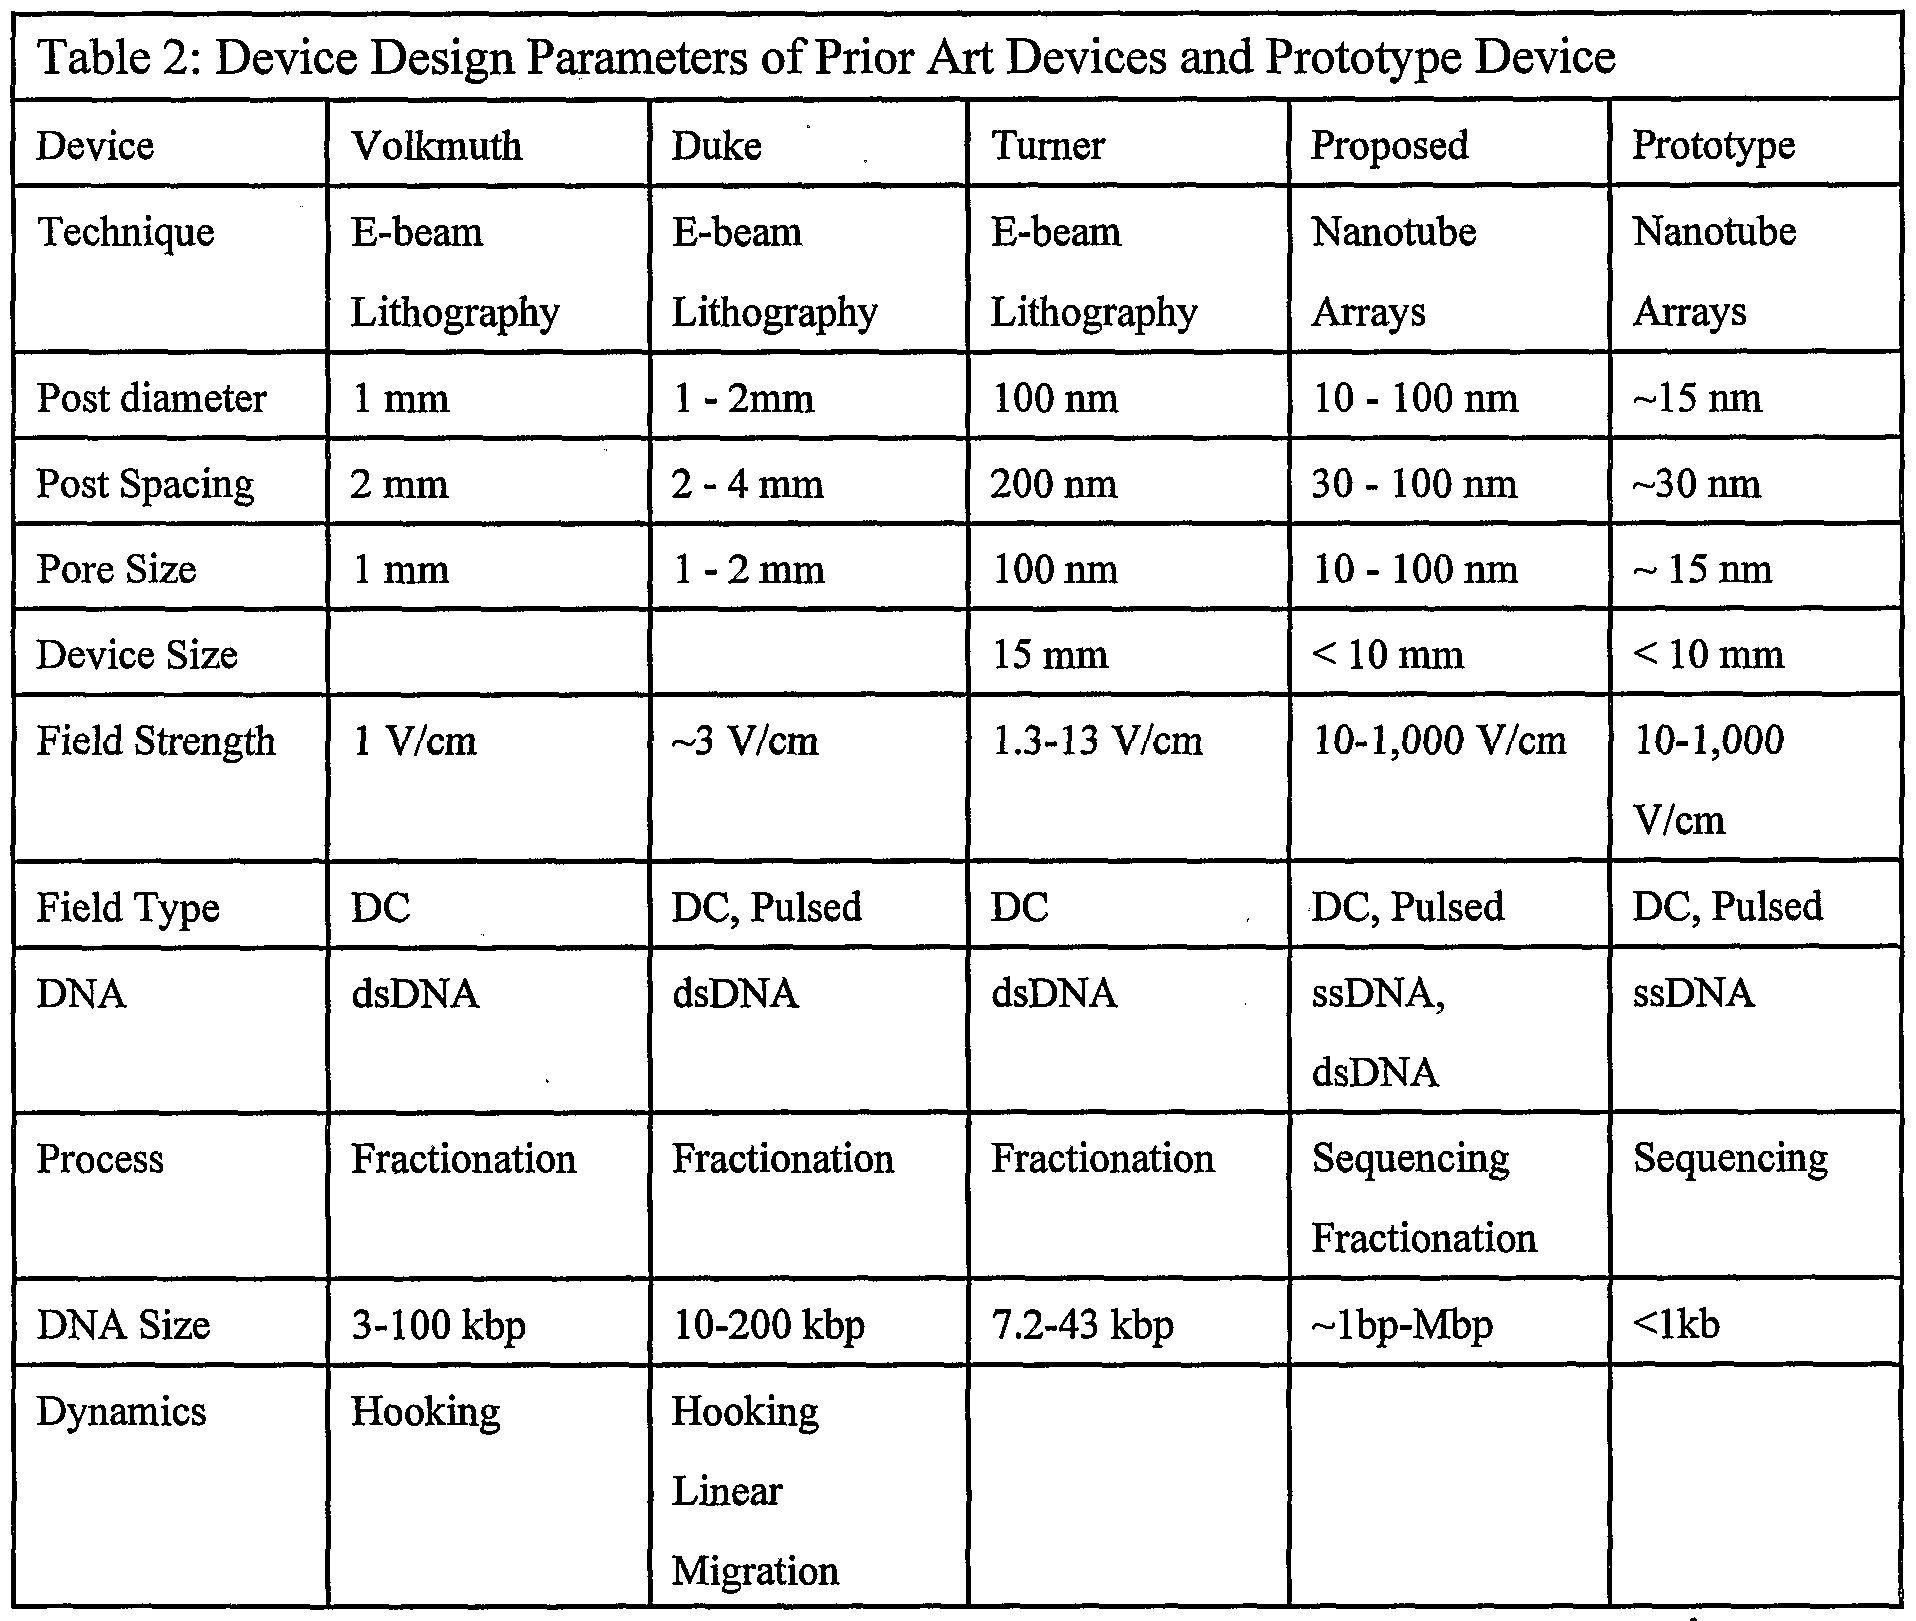 dna fingerprinting diagram 6 way square trailer wiring lennard jones parameters table related keywords